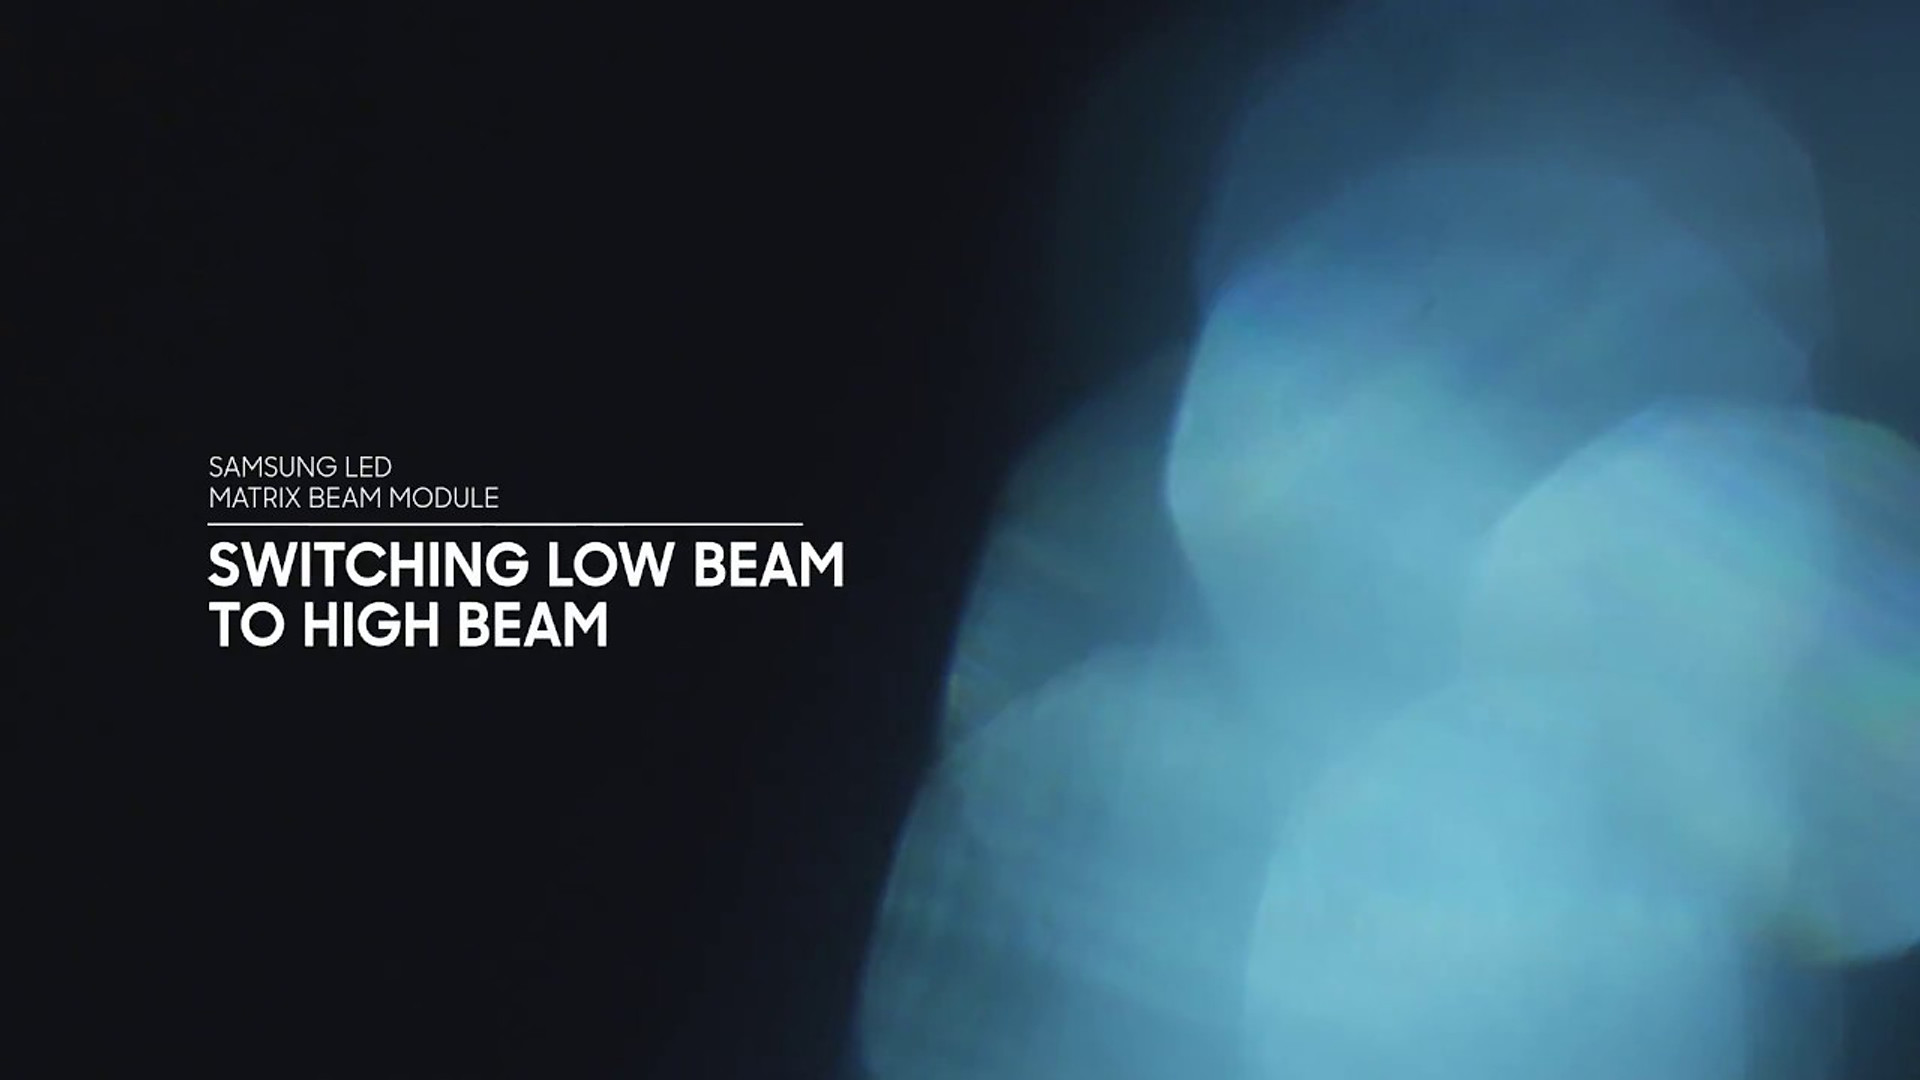 SAMSUNG LED MATRIX BEAM MODULE